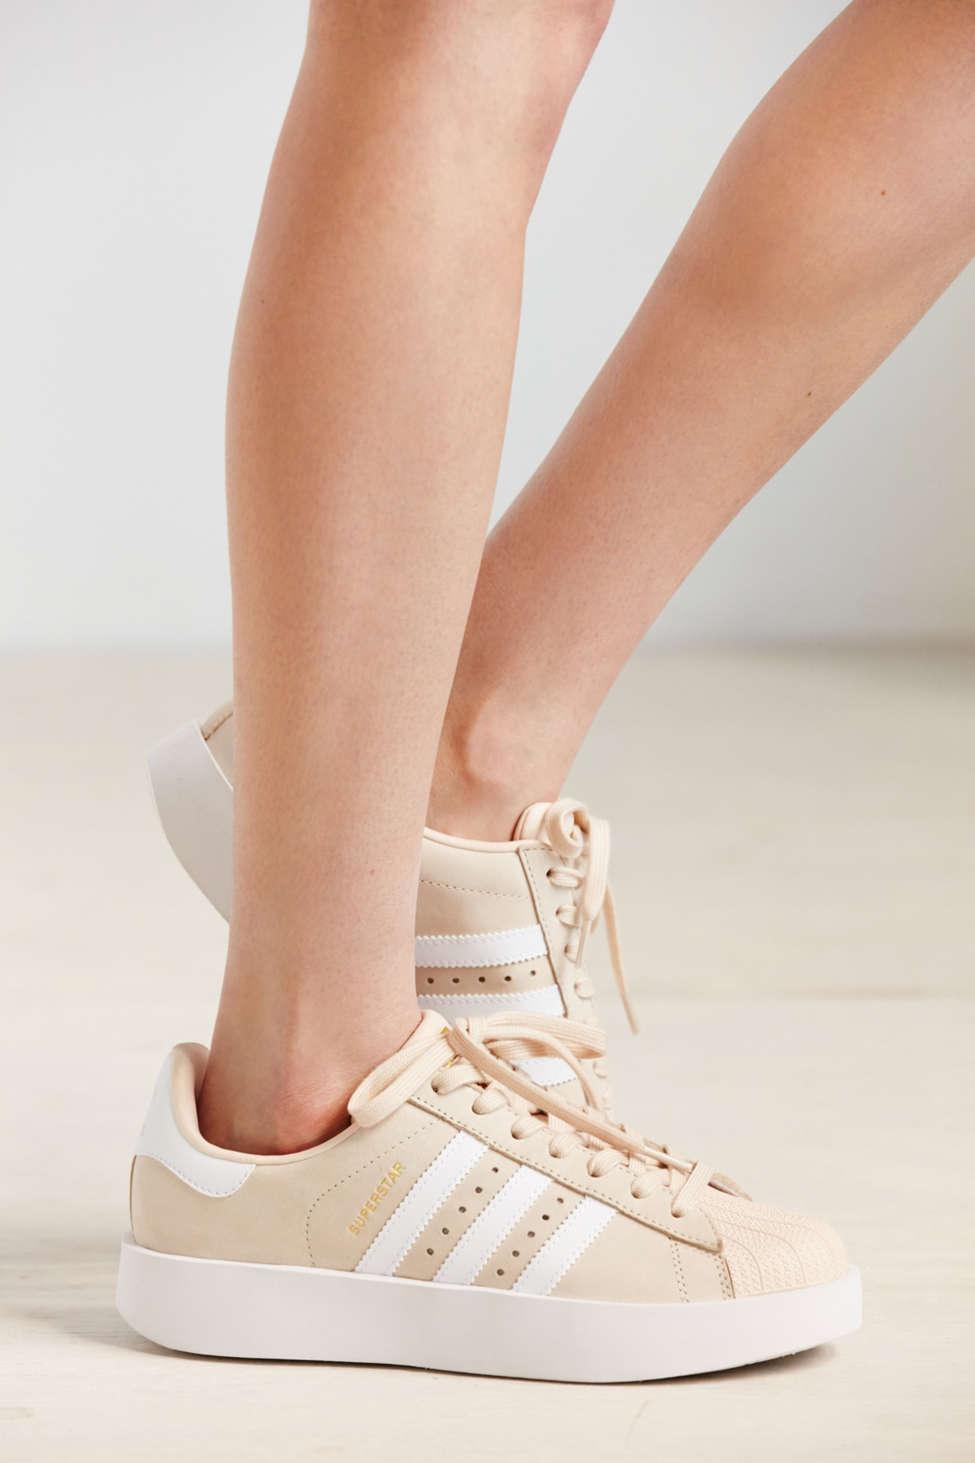 adidas superstar audace piattaforma urban outfitters scarpe originali